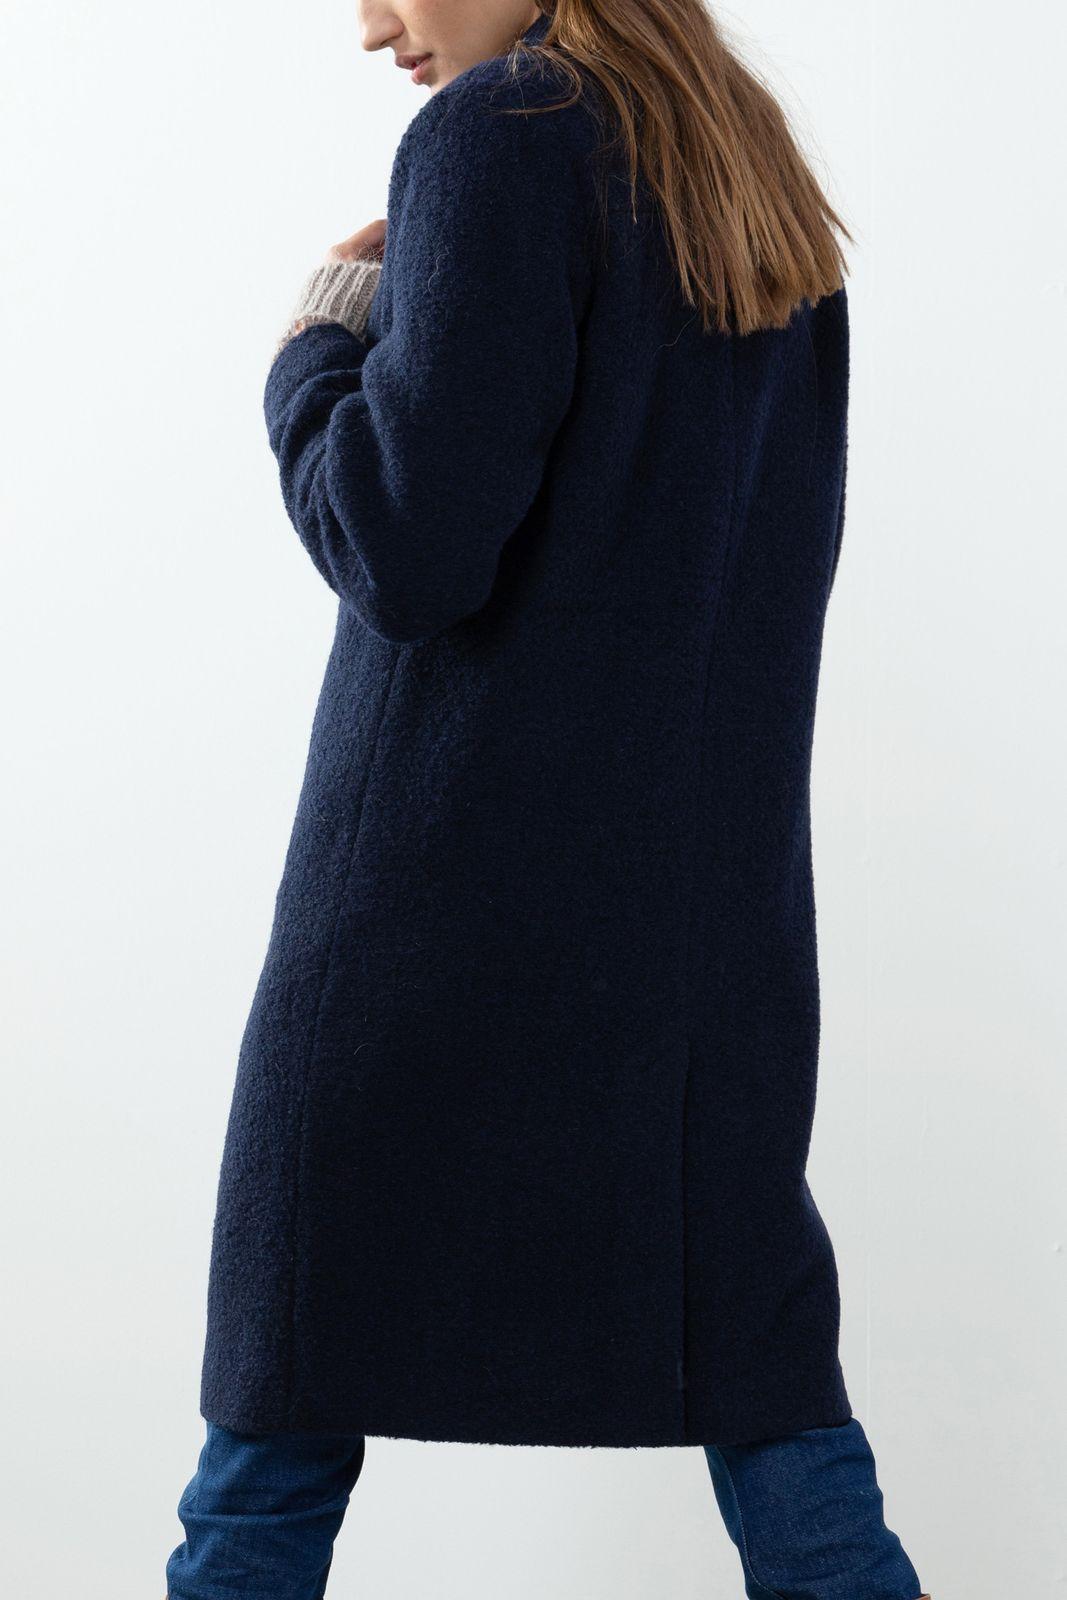 Blauwe lange wollen jas - Dames | Sissy-Boy